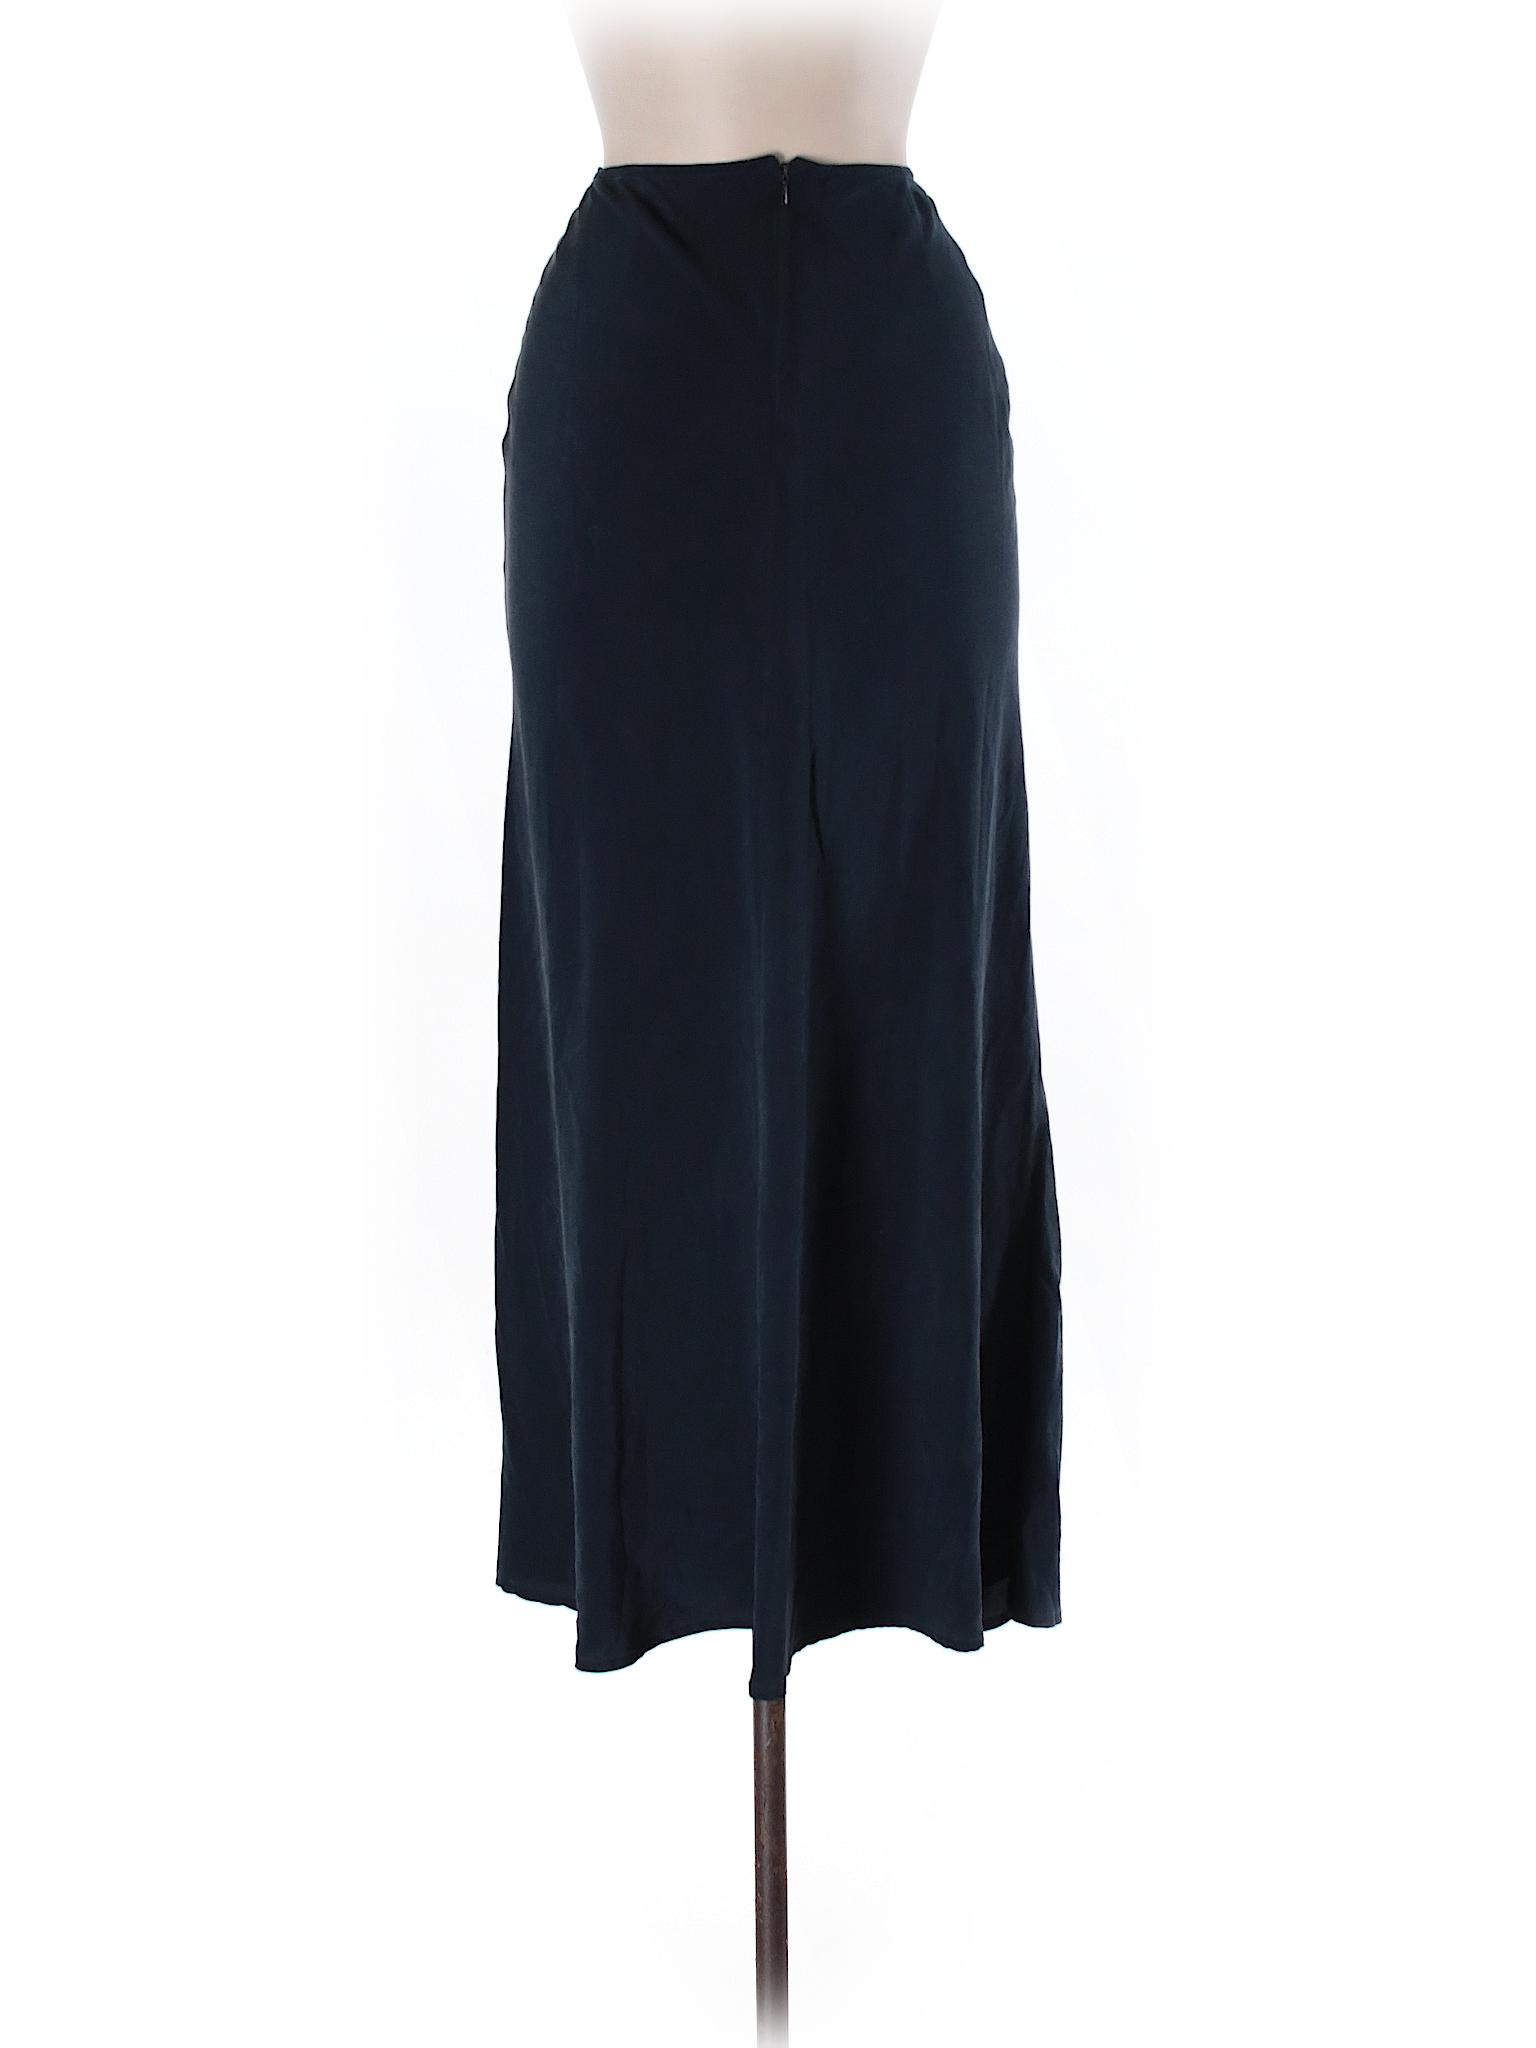 Silk Boutique DKNY Skirt Silk Boutique DKNY Boutique Skirt DKNY Skirt Silk Boutique 4qYXq